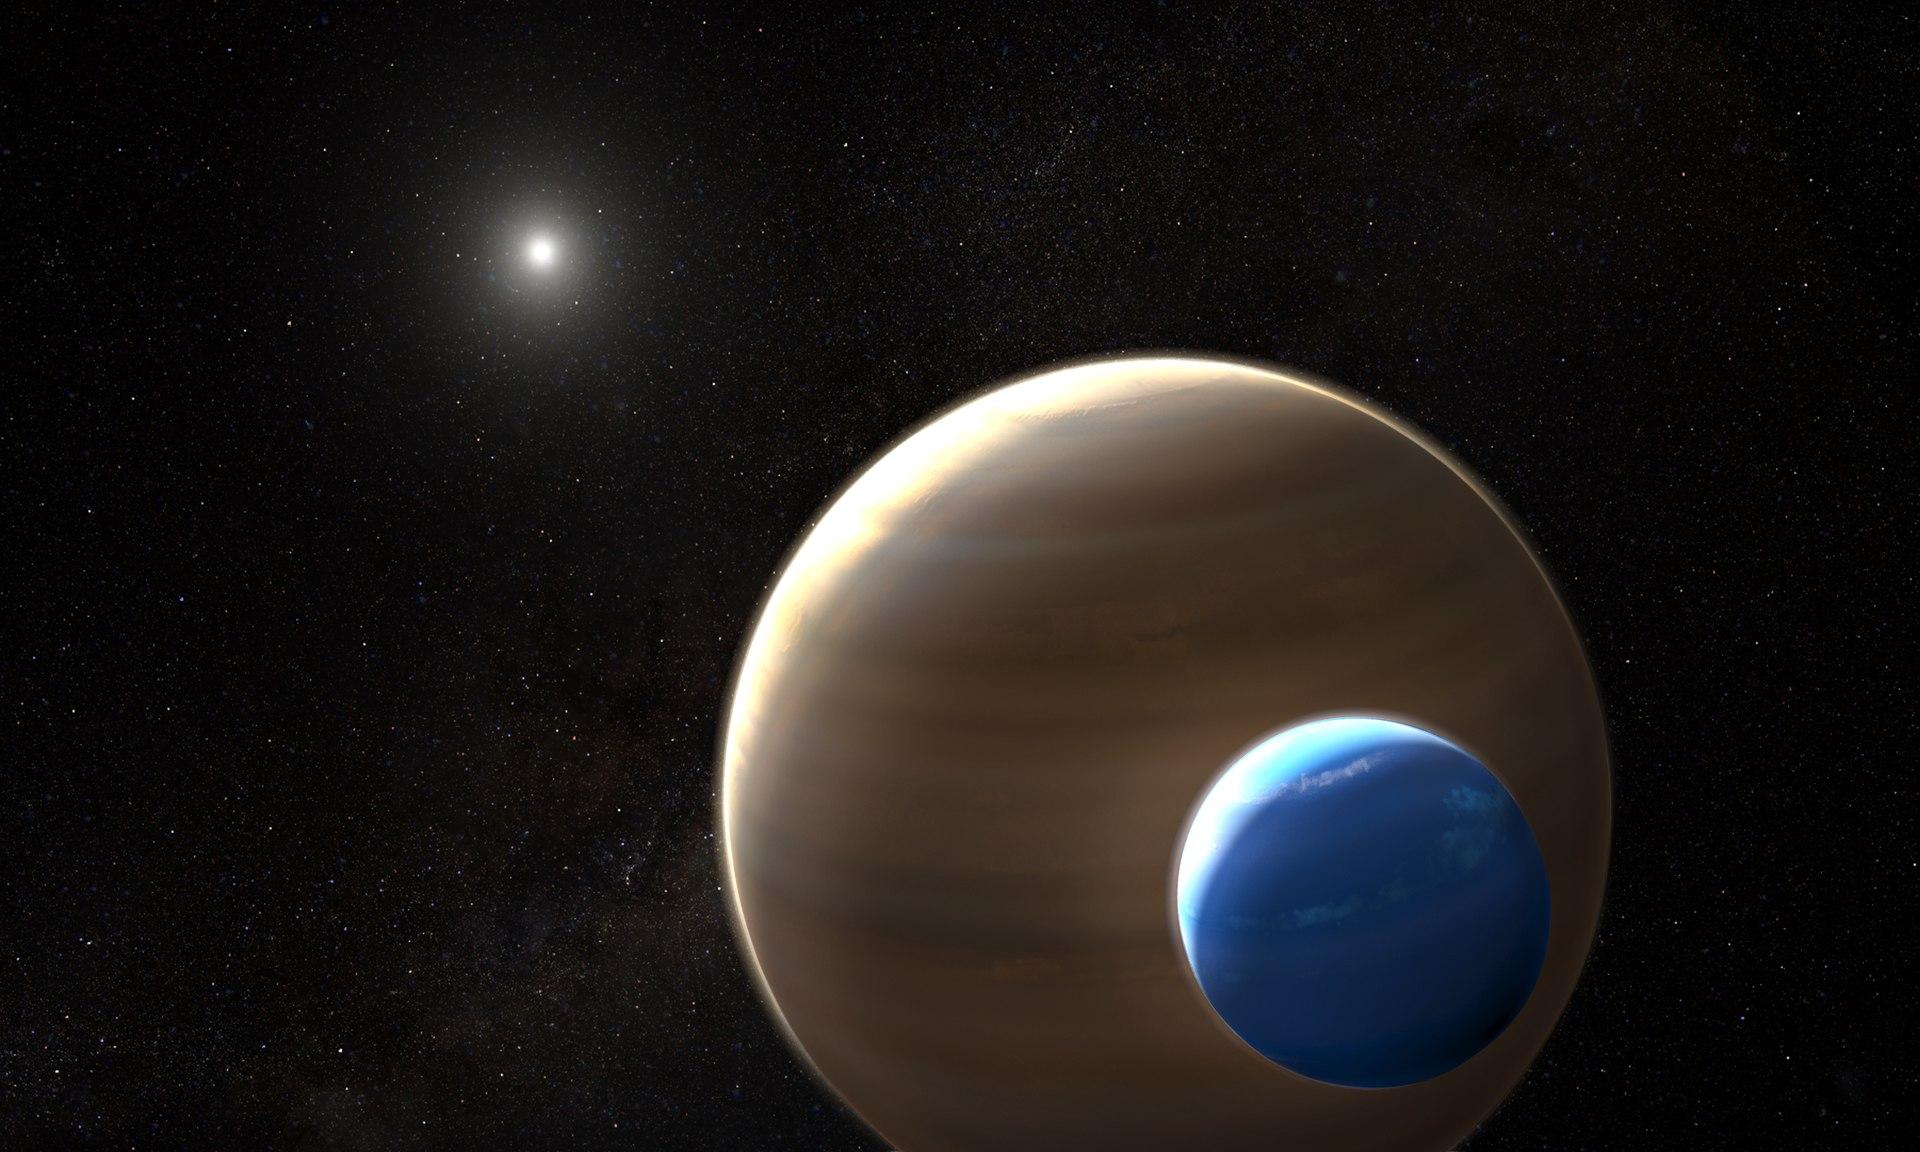 lossy-page1-1920px-exomoon_kepler-1625b-i_orbiting_its_planet_artist_u2019s_impression_tif.jpg